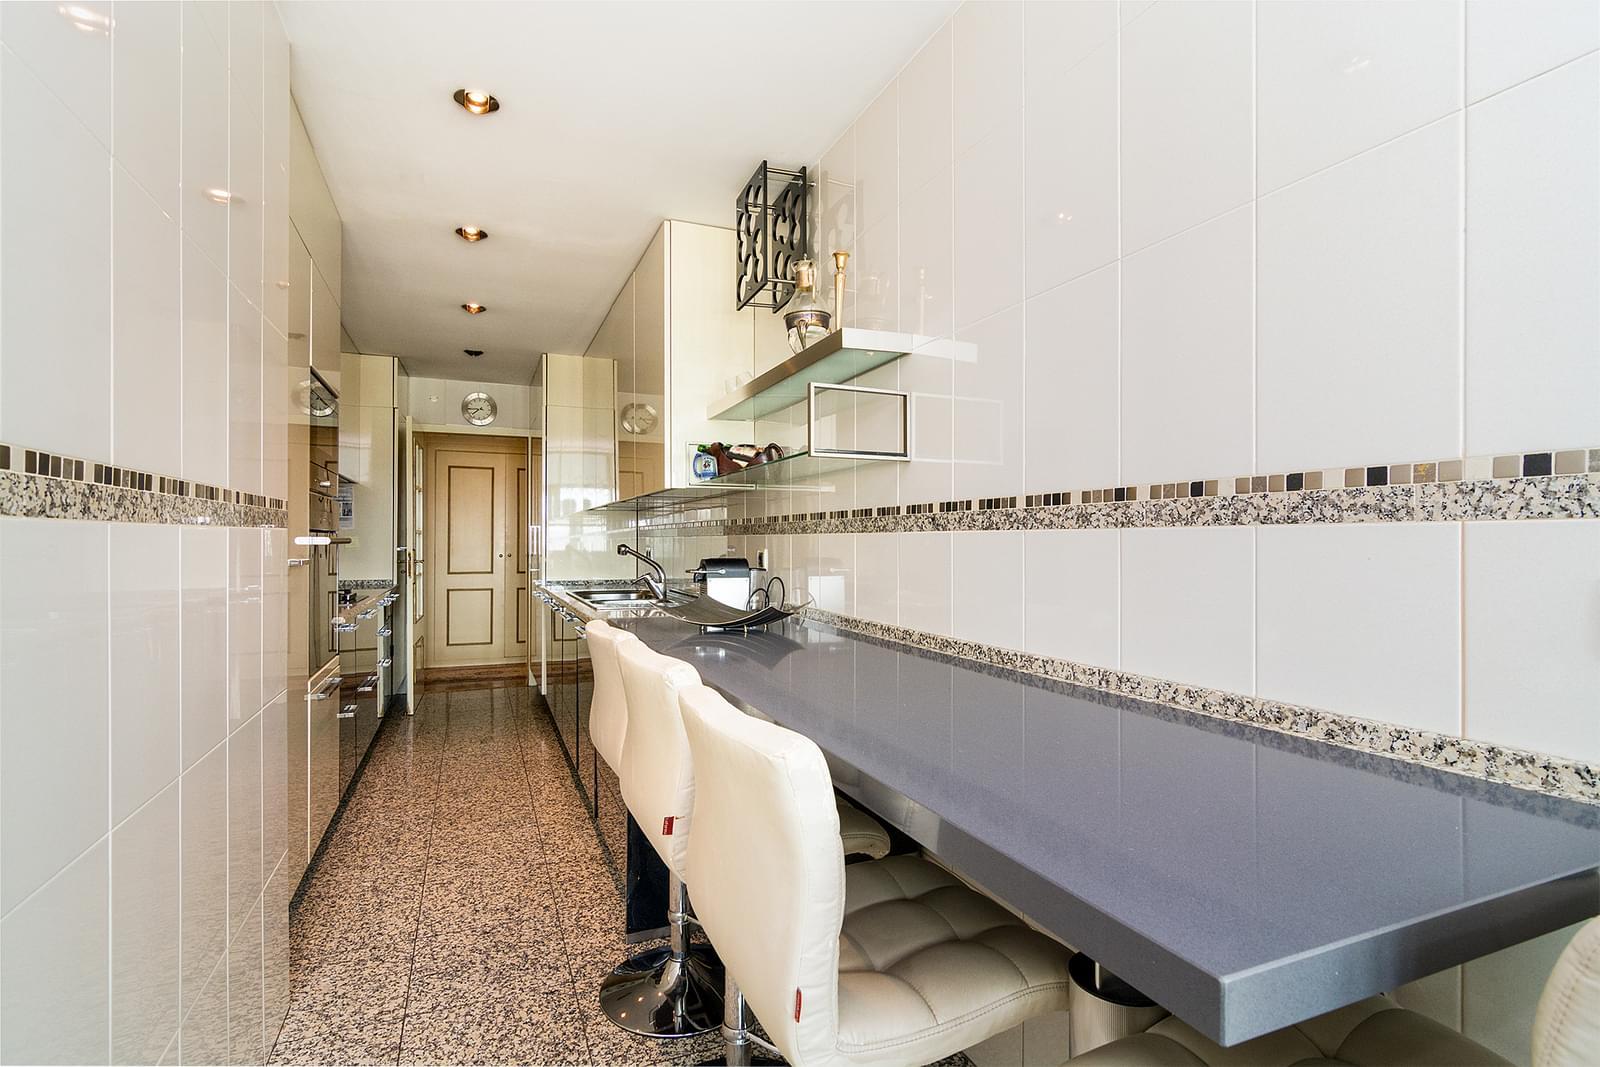 pf17449-apartamento-t4-lisboa-aa7d8827-c2f2-4d36-98d6-0b14f9a00489